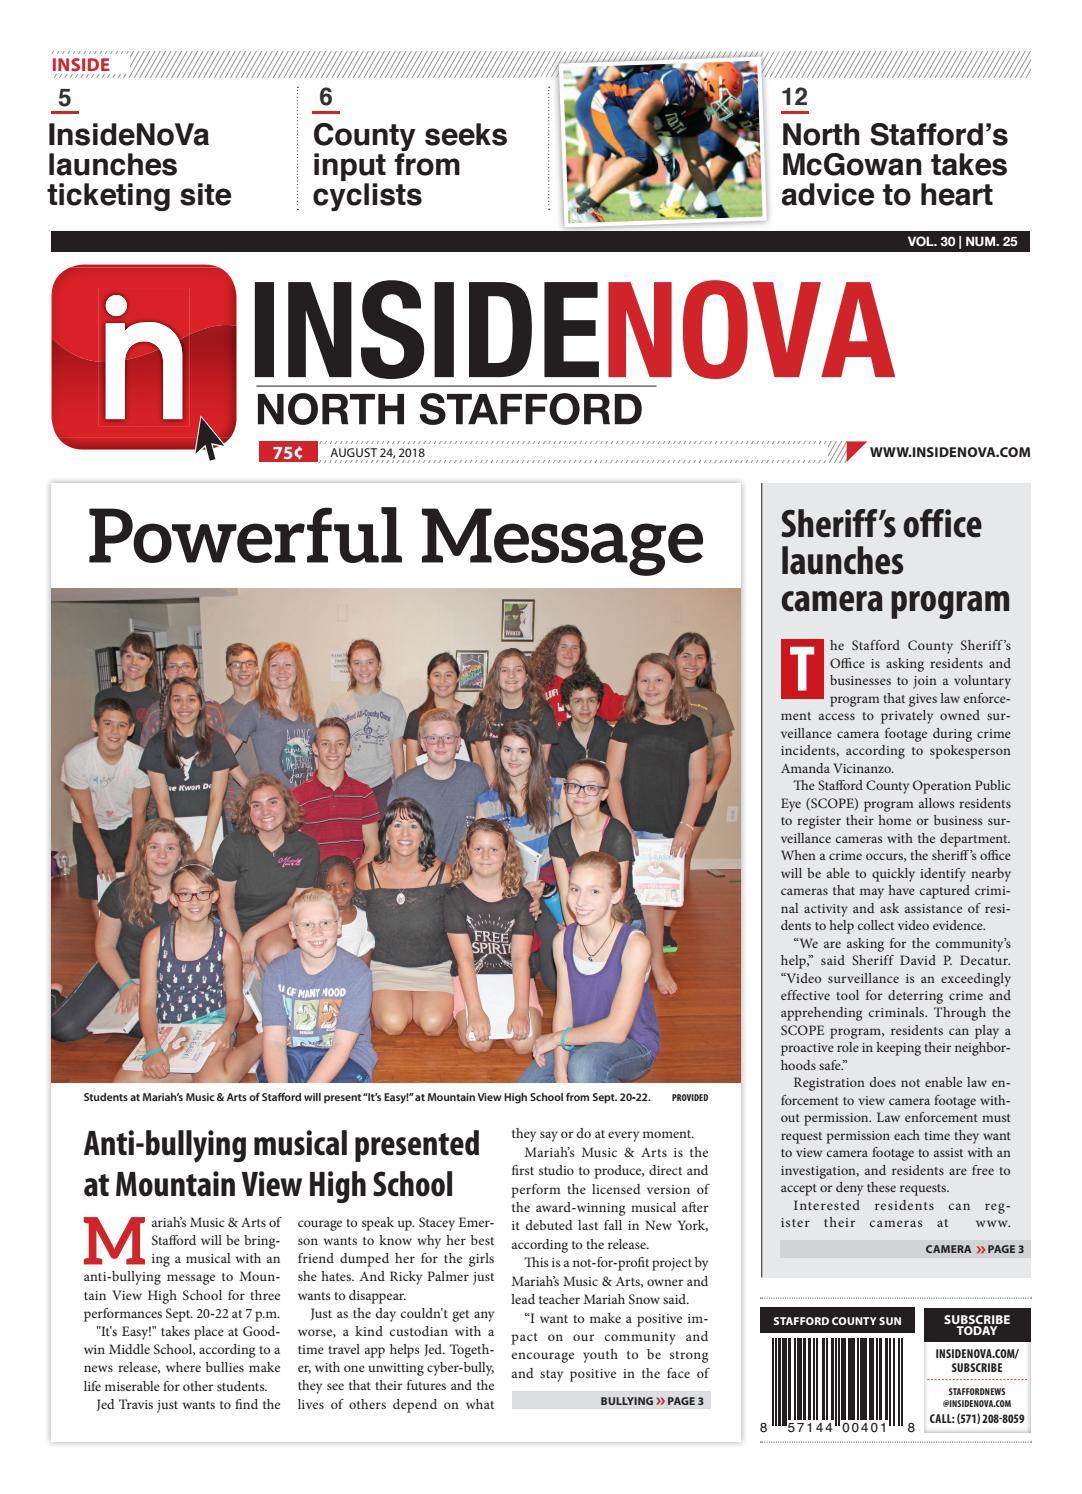 InsideNoVa/North Stafford, August 24, 2018 by InsideNoVa - issuu